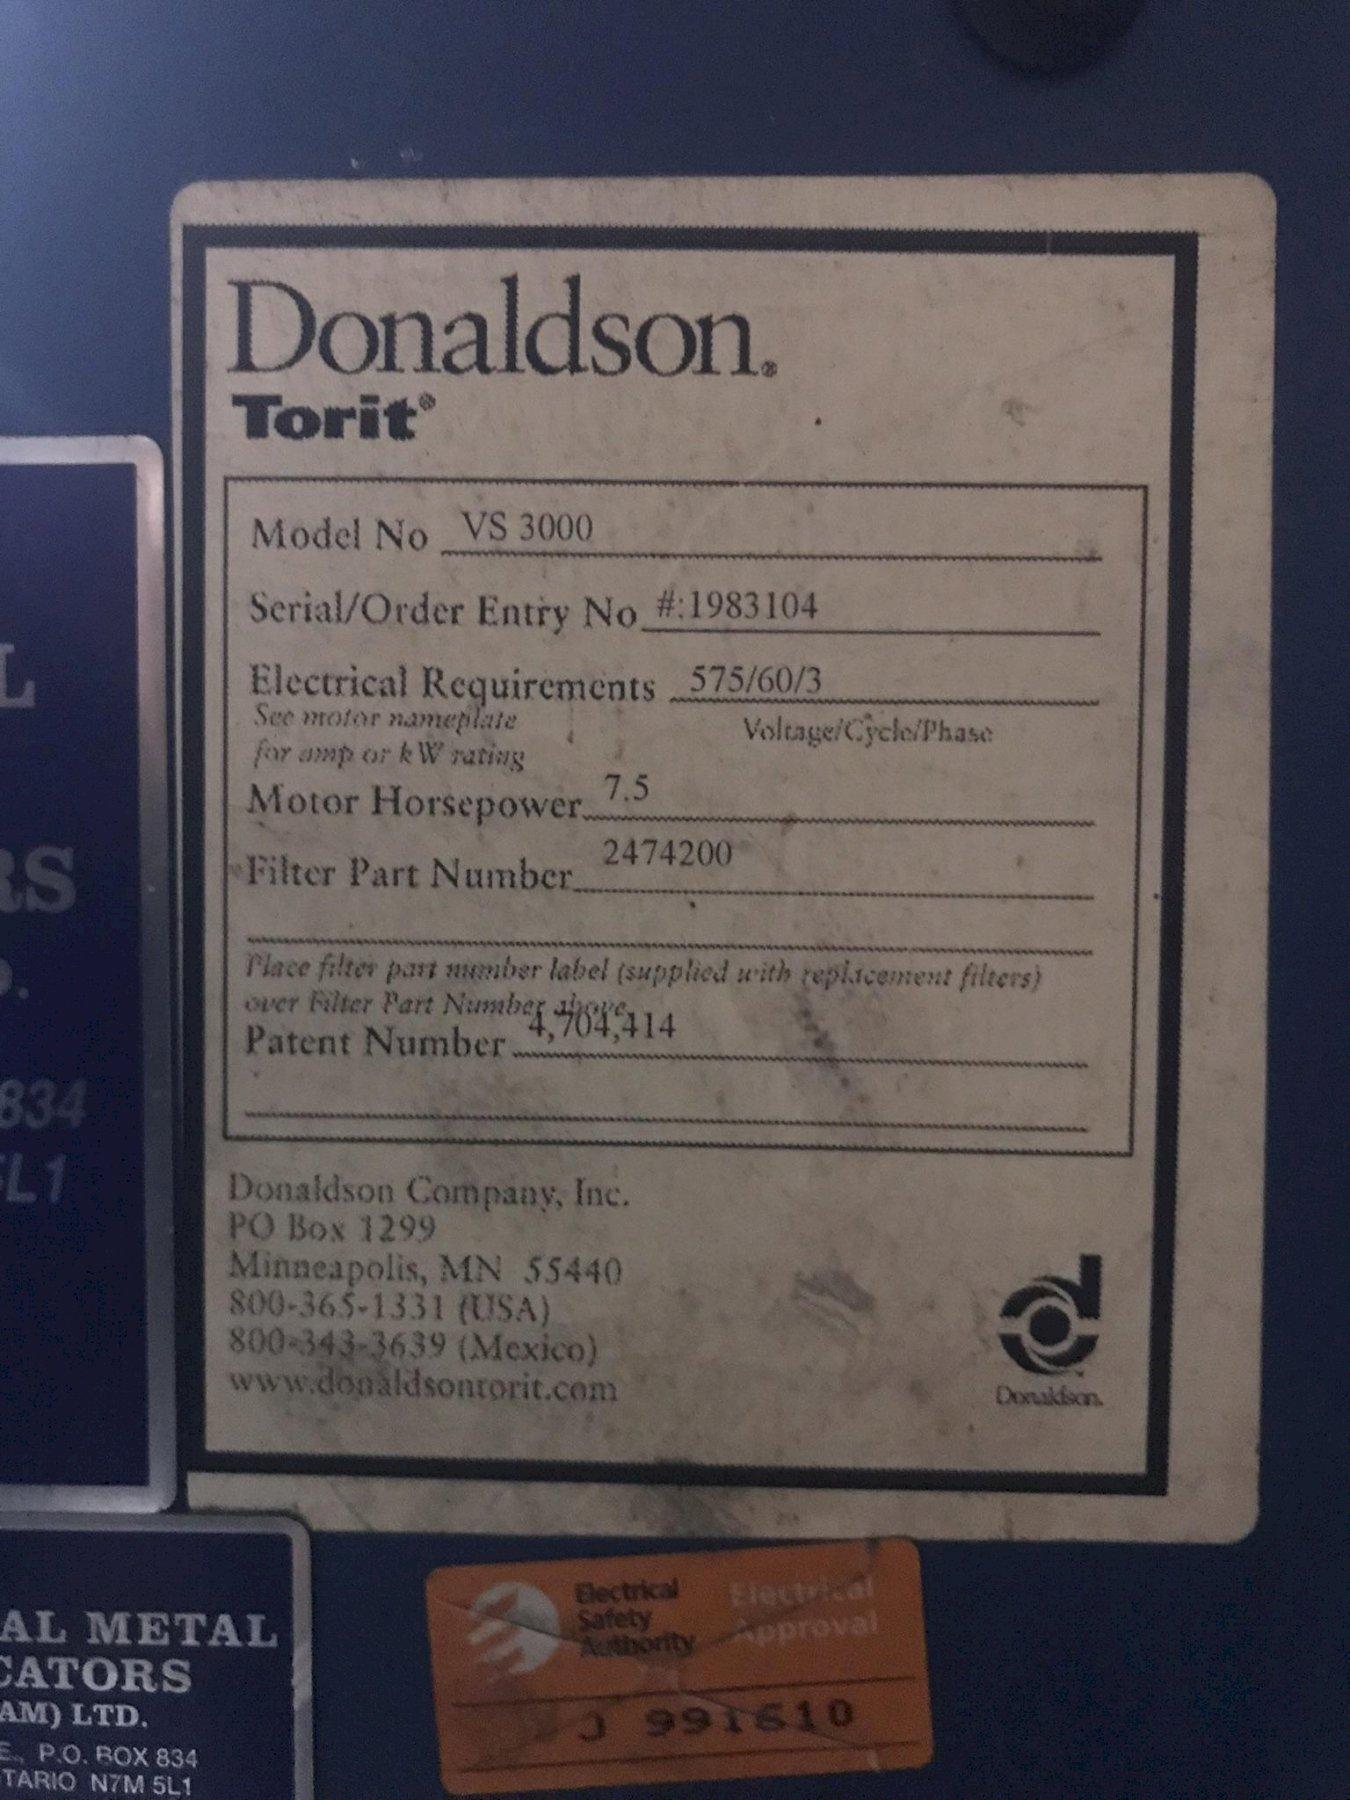 USED DONALDSON TORIT VIBRA SHAKE DUST COLLECTOR MODEL VS3000, Stk# 10722, Year 2005